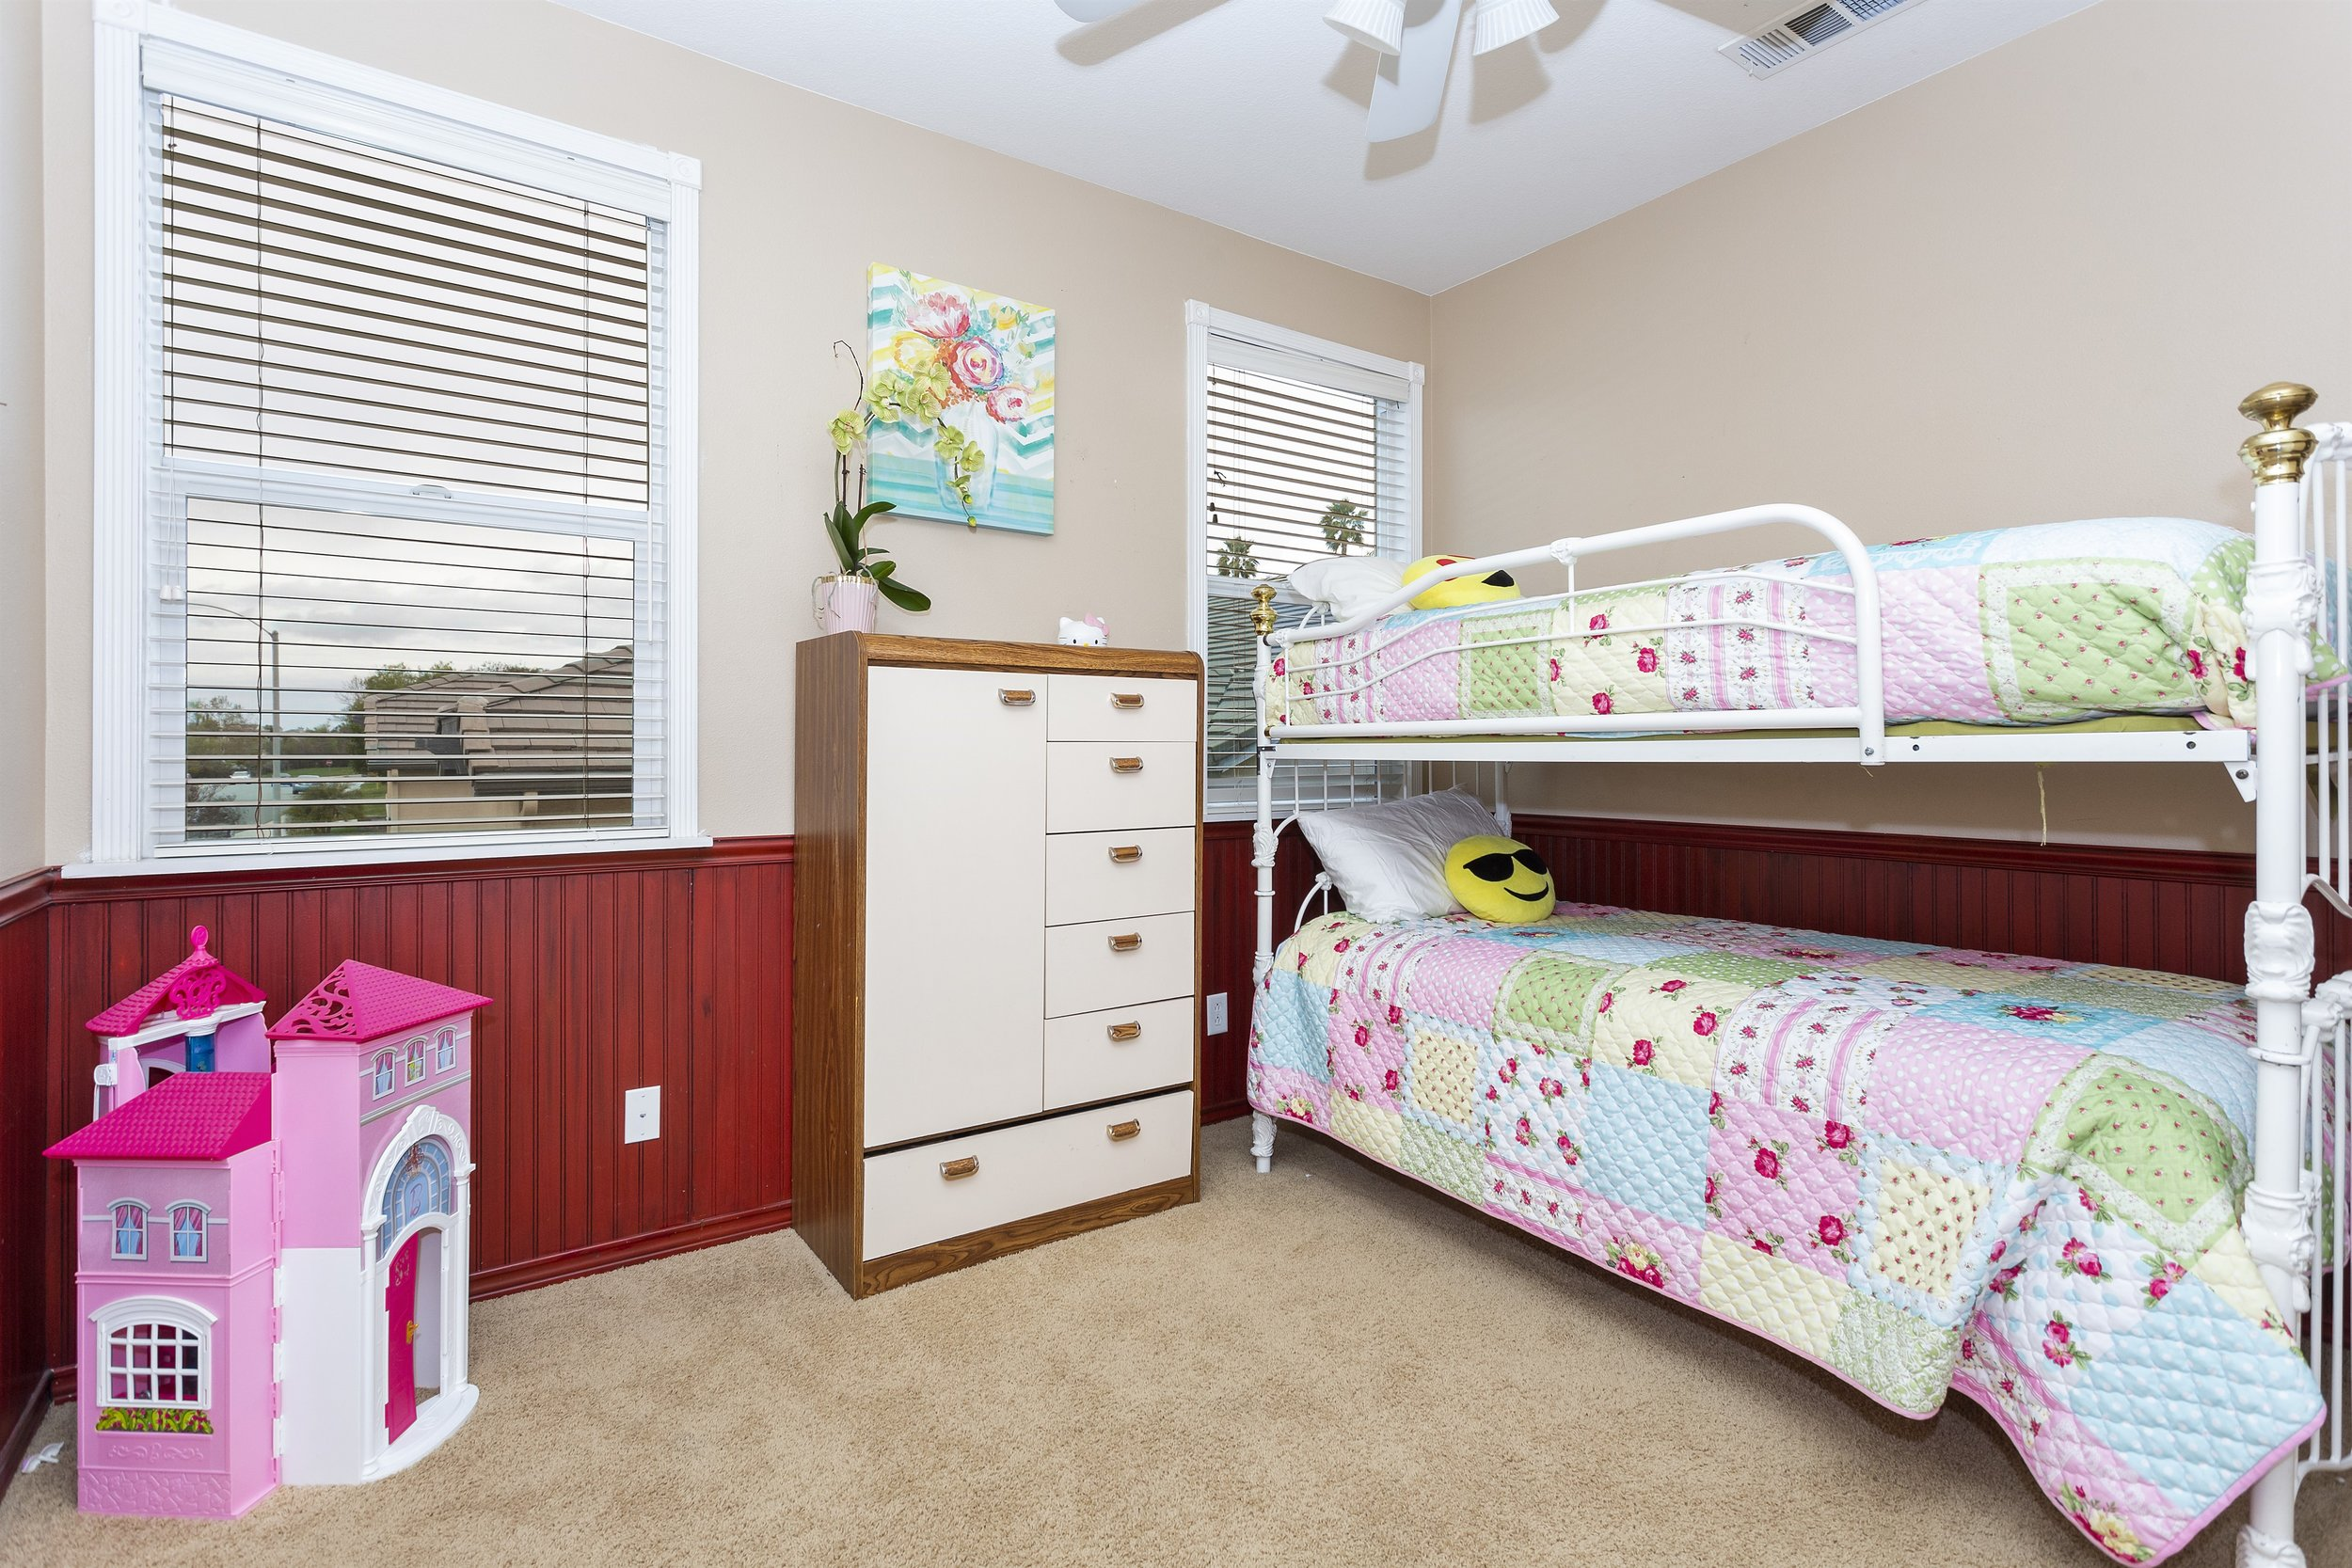 029_2nd Floor Bedroom.jpg